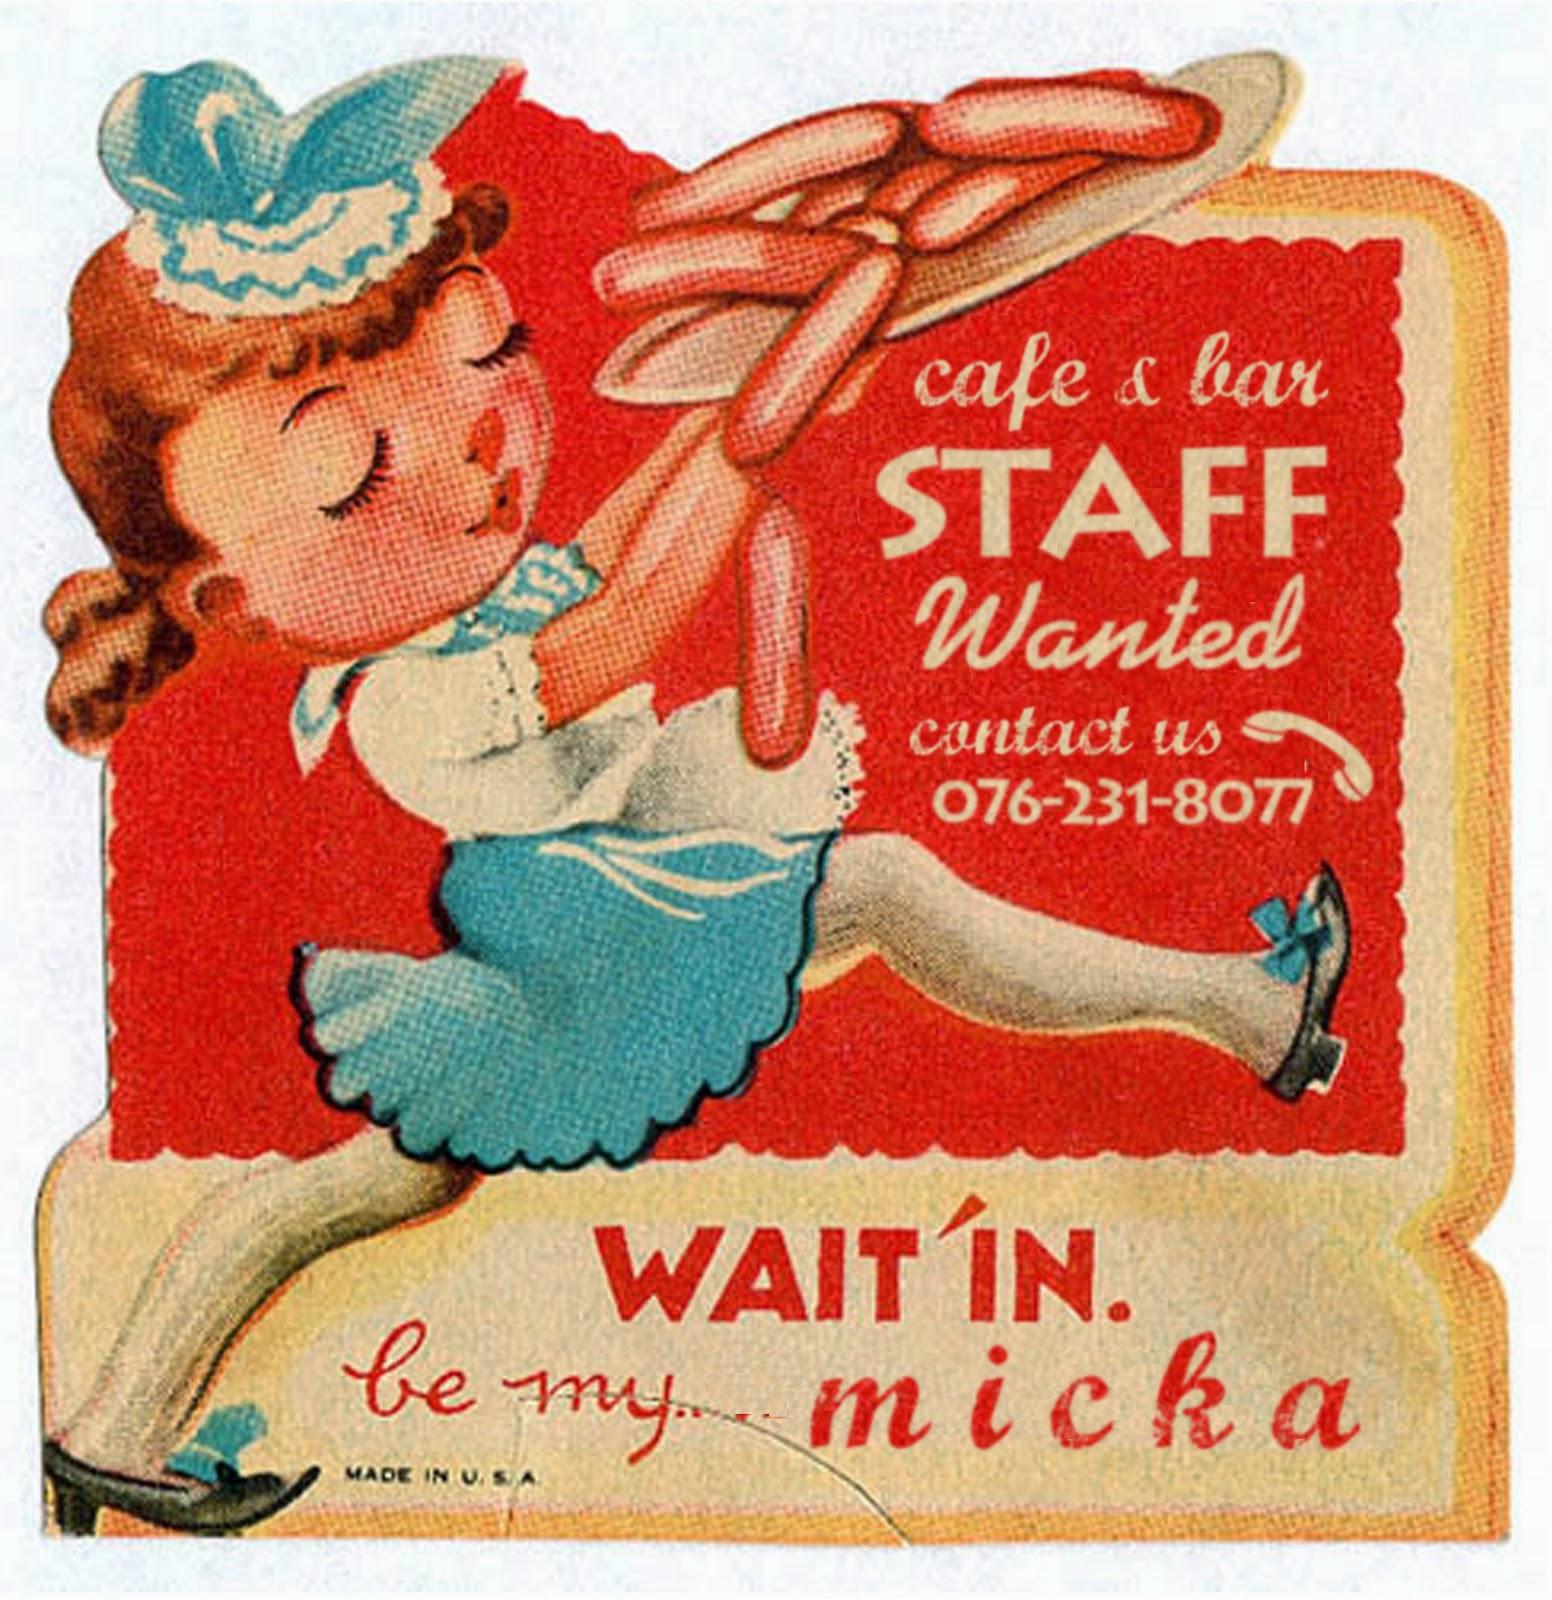 cafe & bar micka 金沢 カフェ 求人 アルバイト